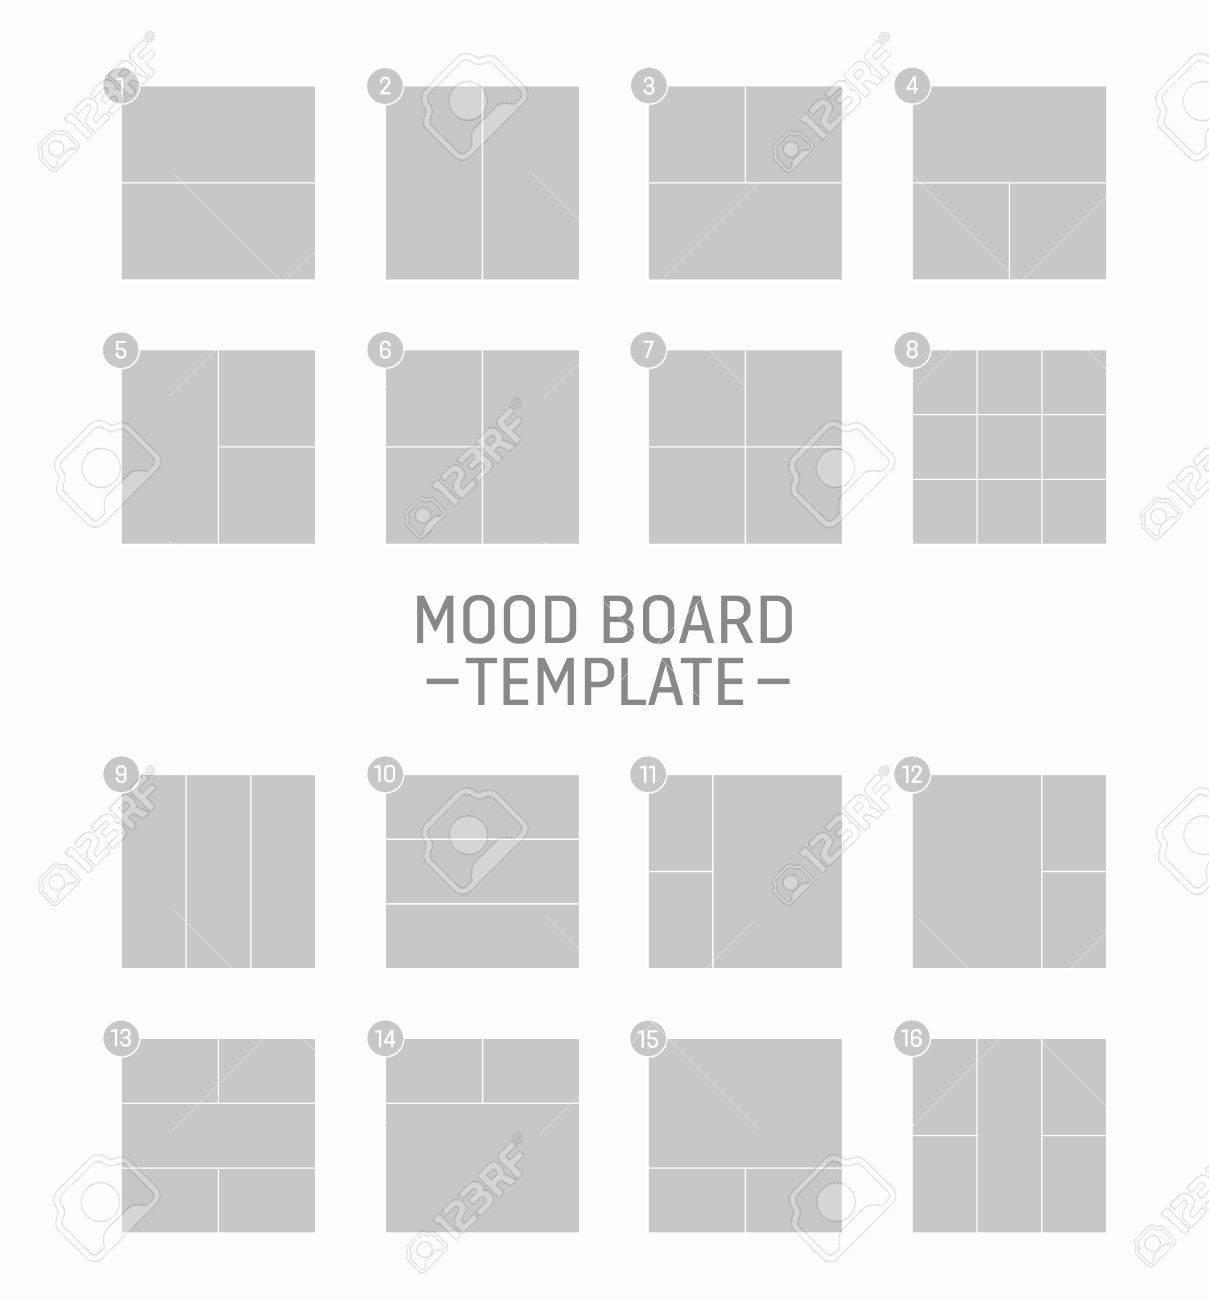 Vector Mood Board Photo Templates Royalty Free Cliparts, Vectors ...